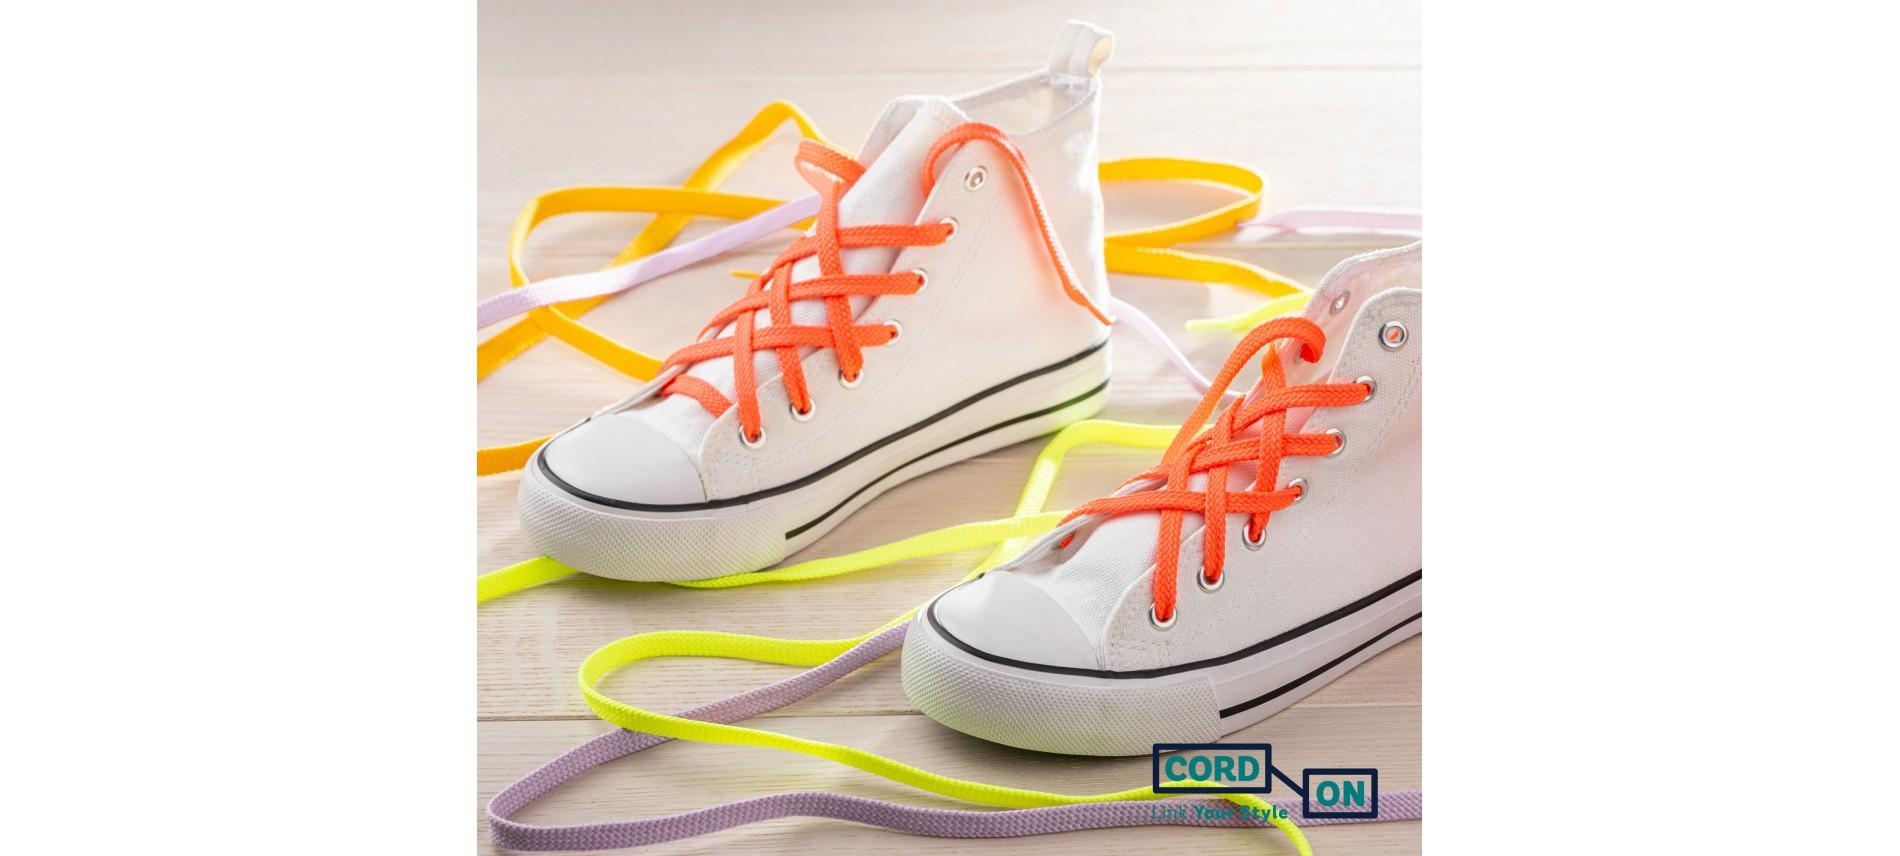 Cordones planos casual para calzado